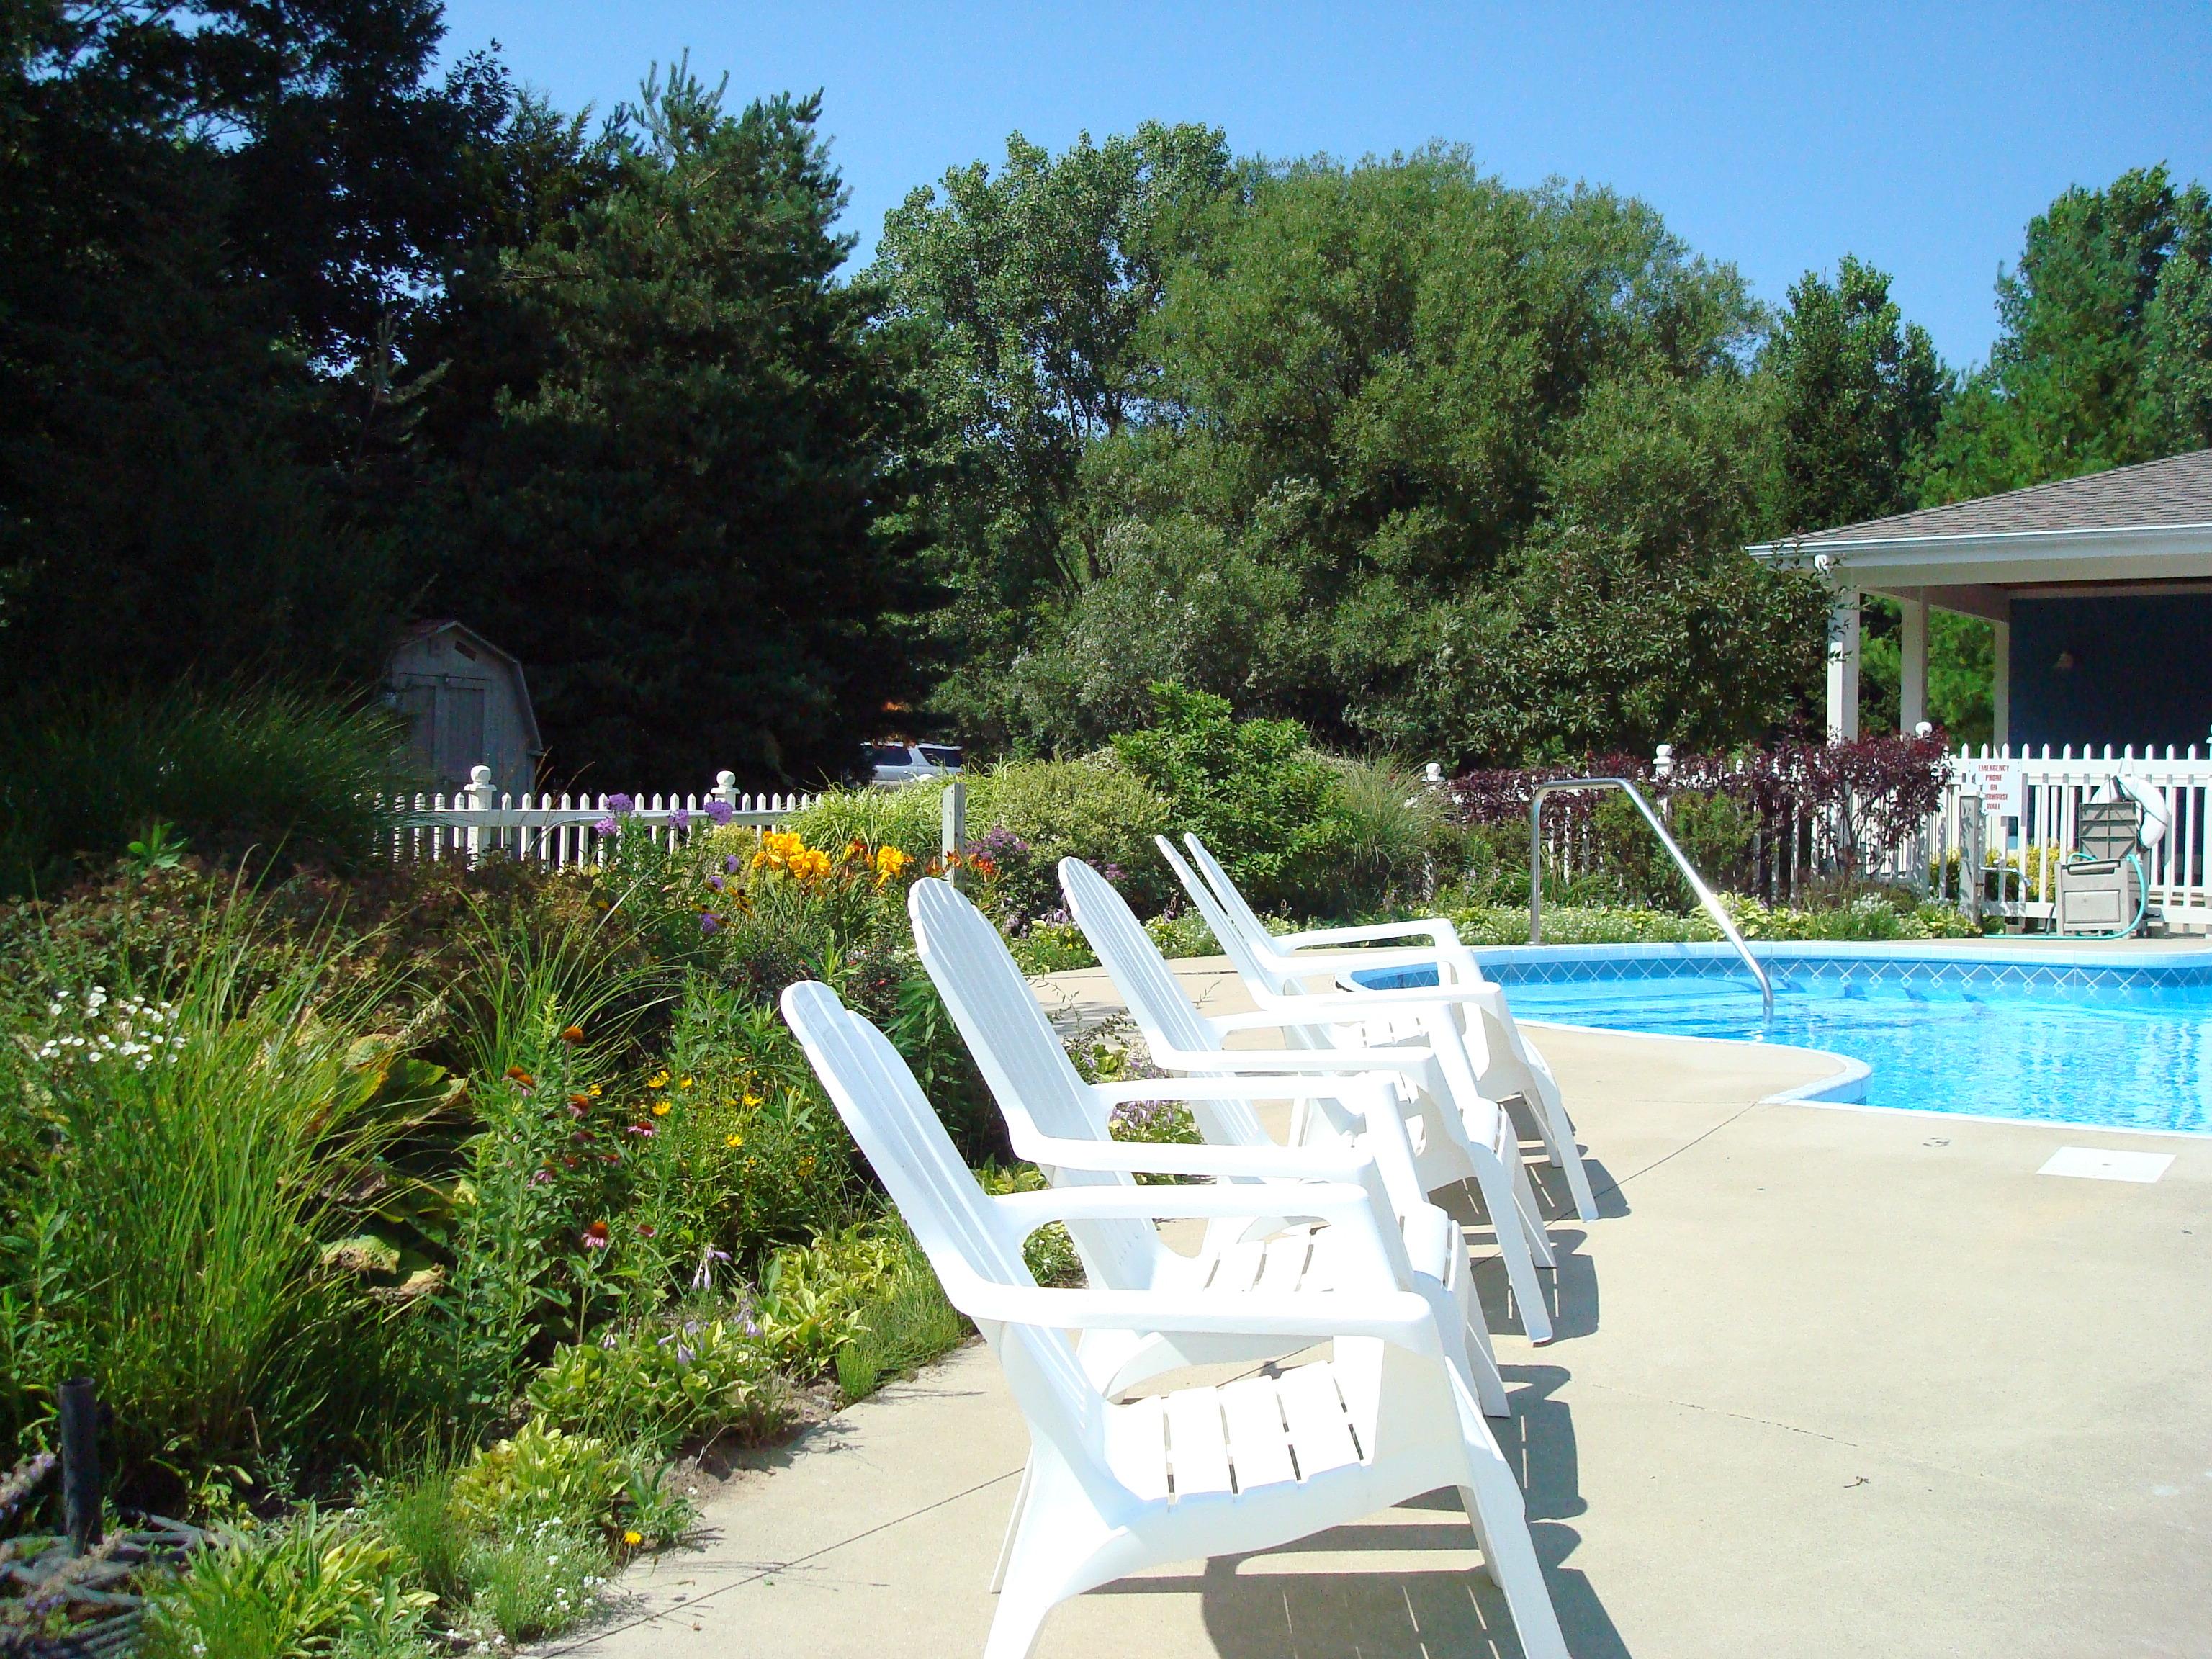 South Haven Marina Pool deck